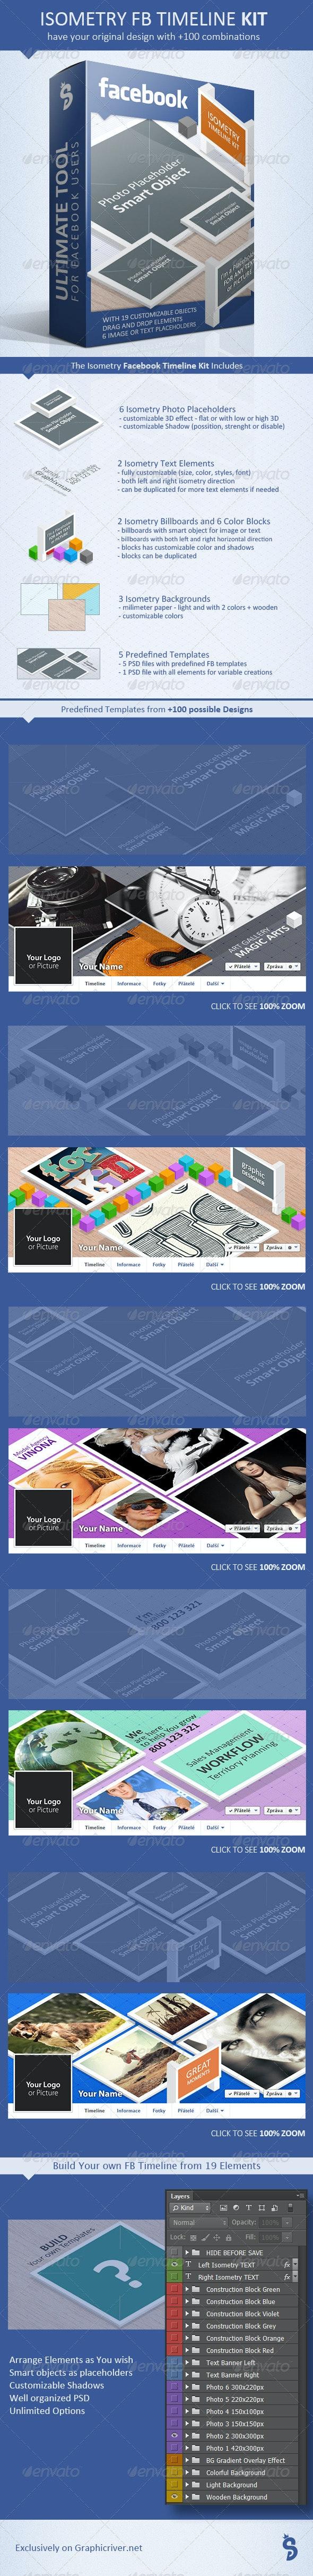 Facebook Timeline Kit - Isometry - Facebook Timeline Covers Social Media